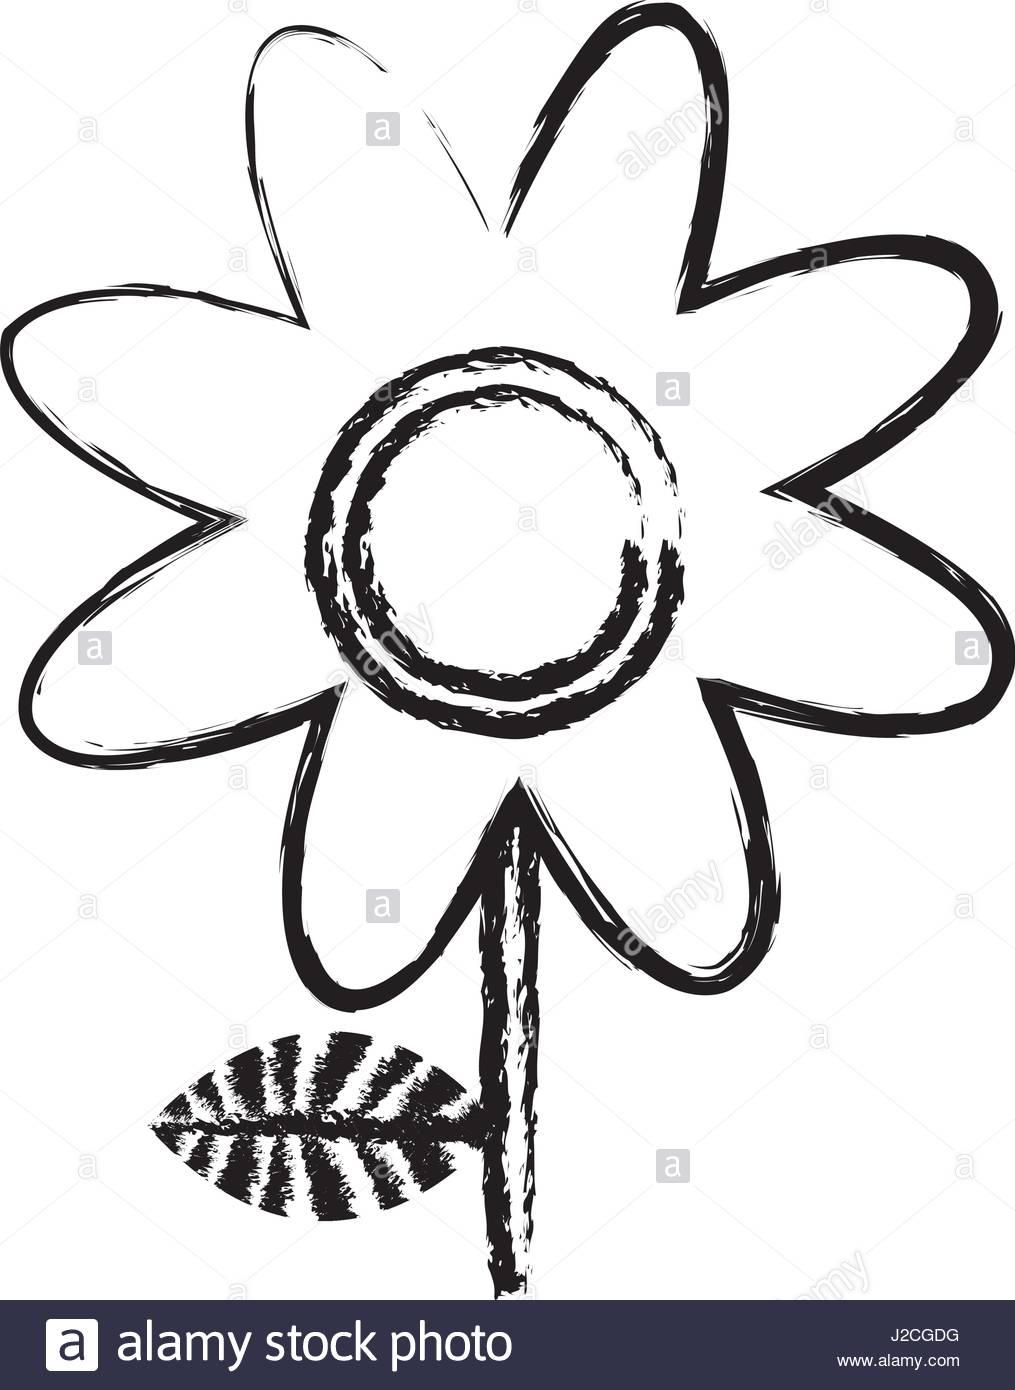 1015x1390 Monochrome Blurred Silhouette Of Daisy Flower Stock Vector Art